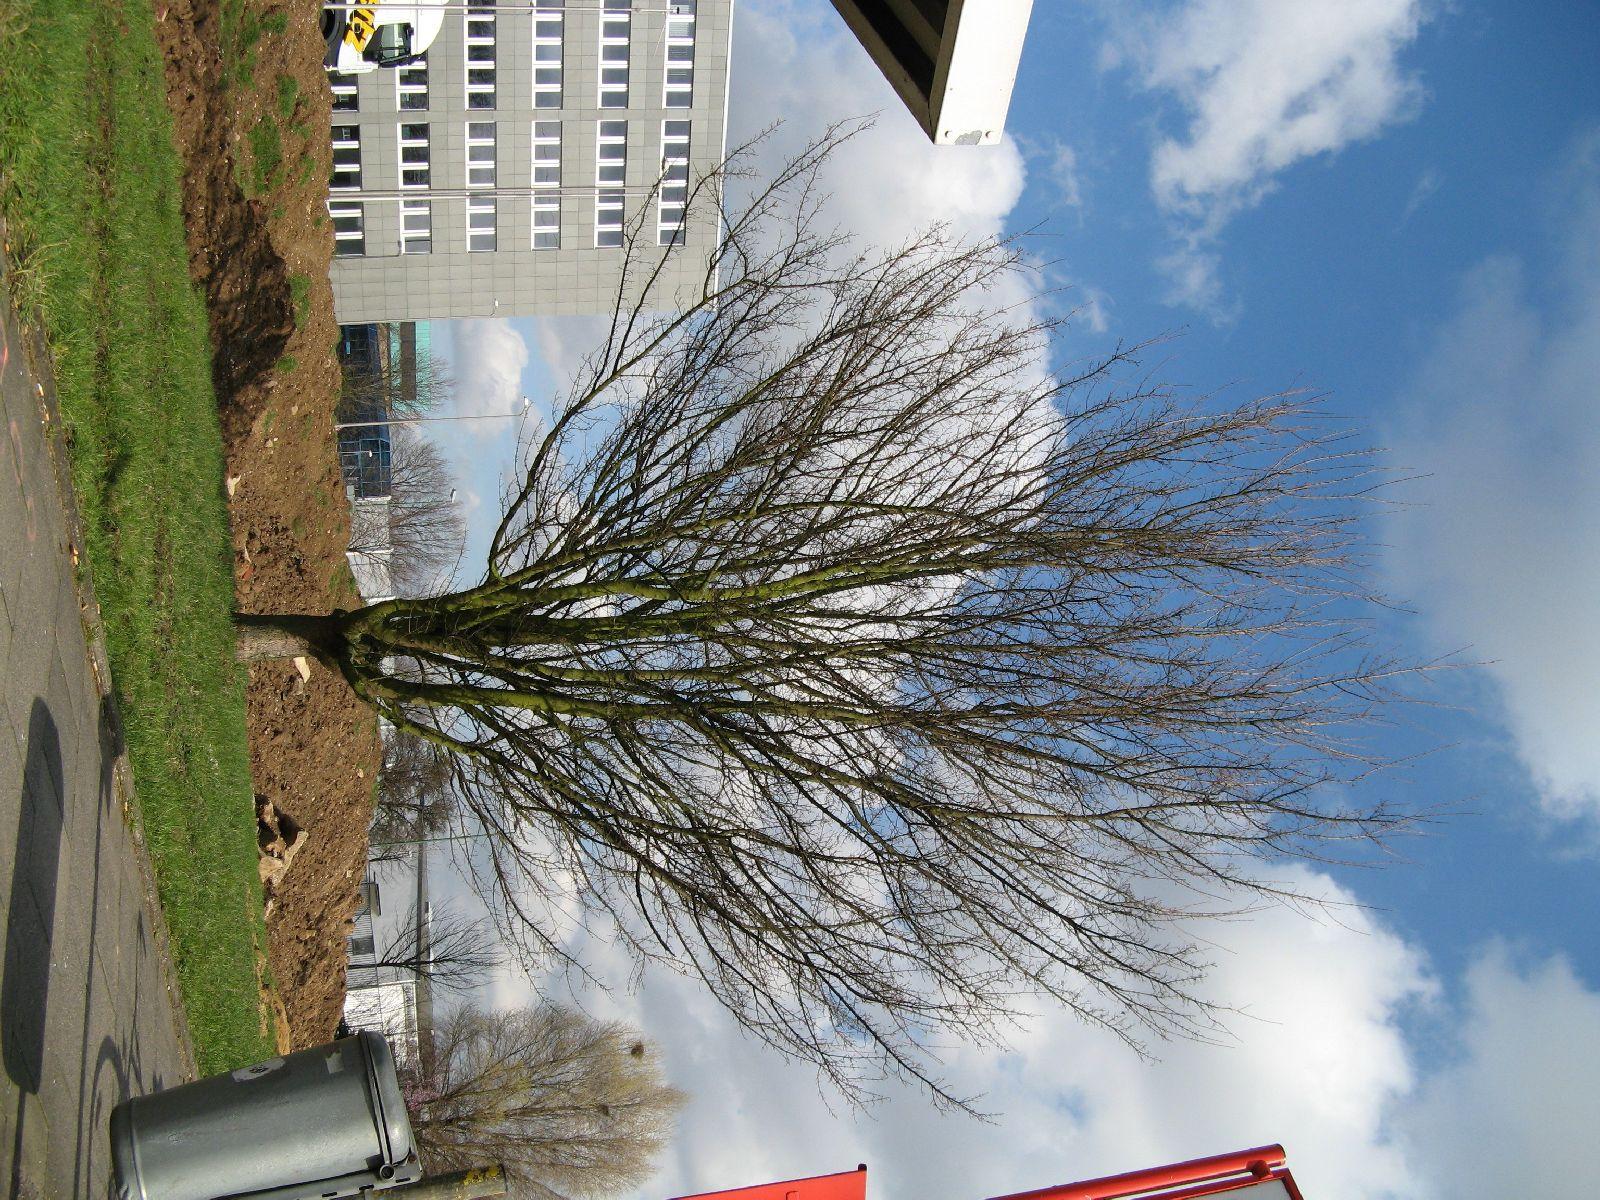 Plants-Trees_Photo_Texture_B_41270